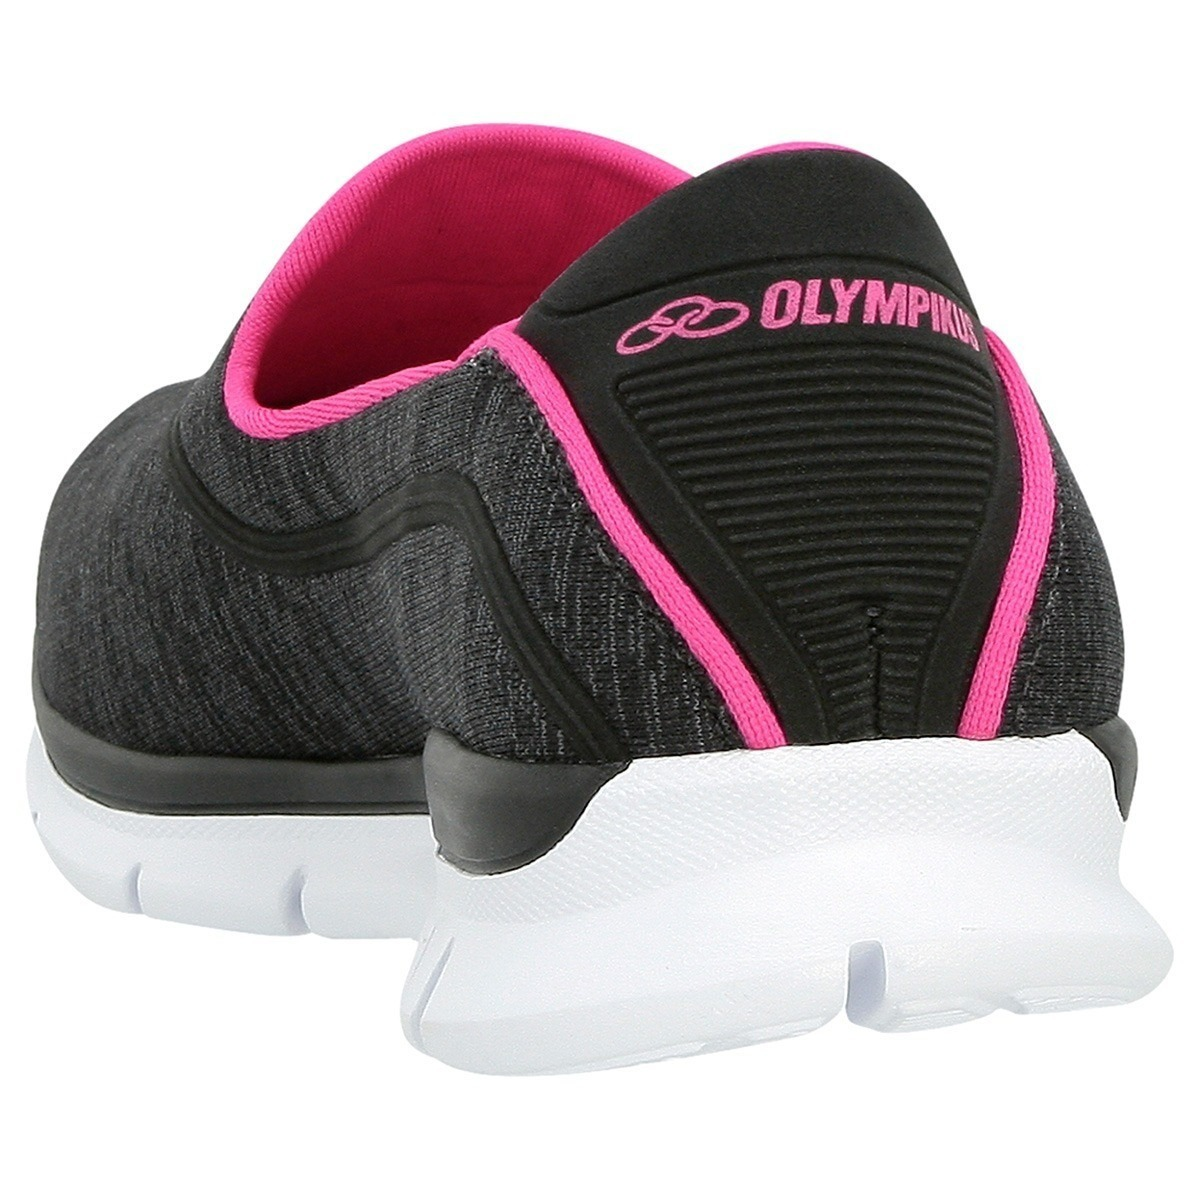 54ea89a8d8f Kit 3 Sapatilha Tenis Olympikus Angel Feetpad Original Ofert - R ...